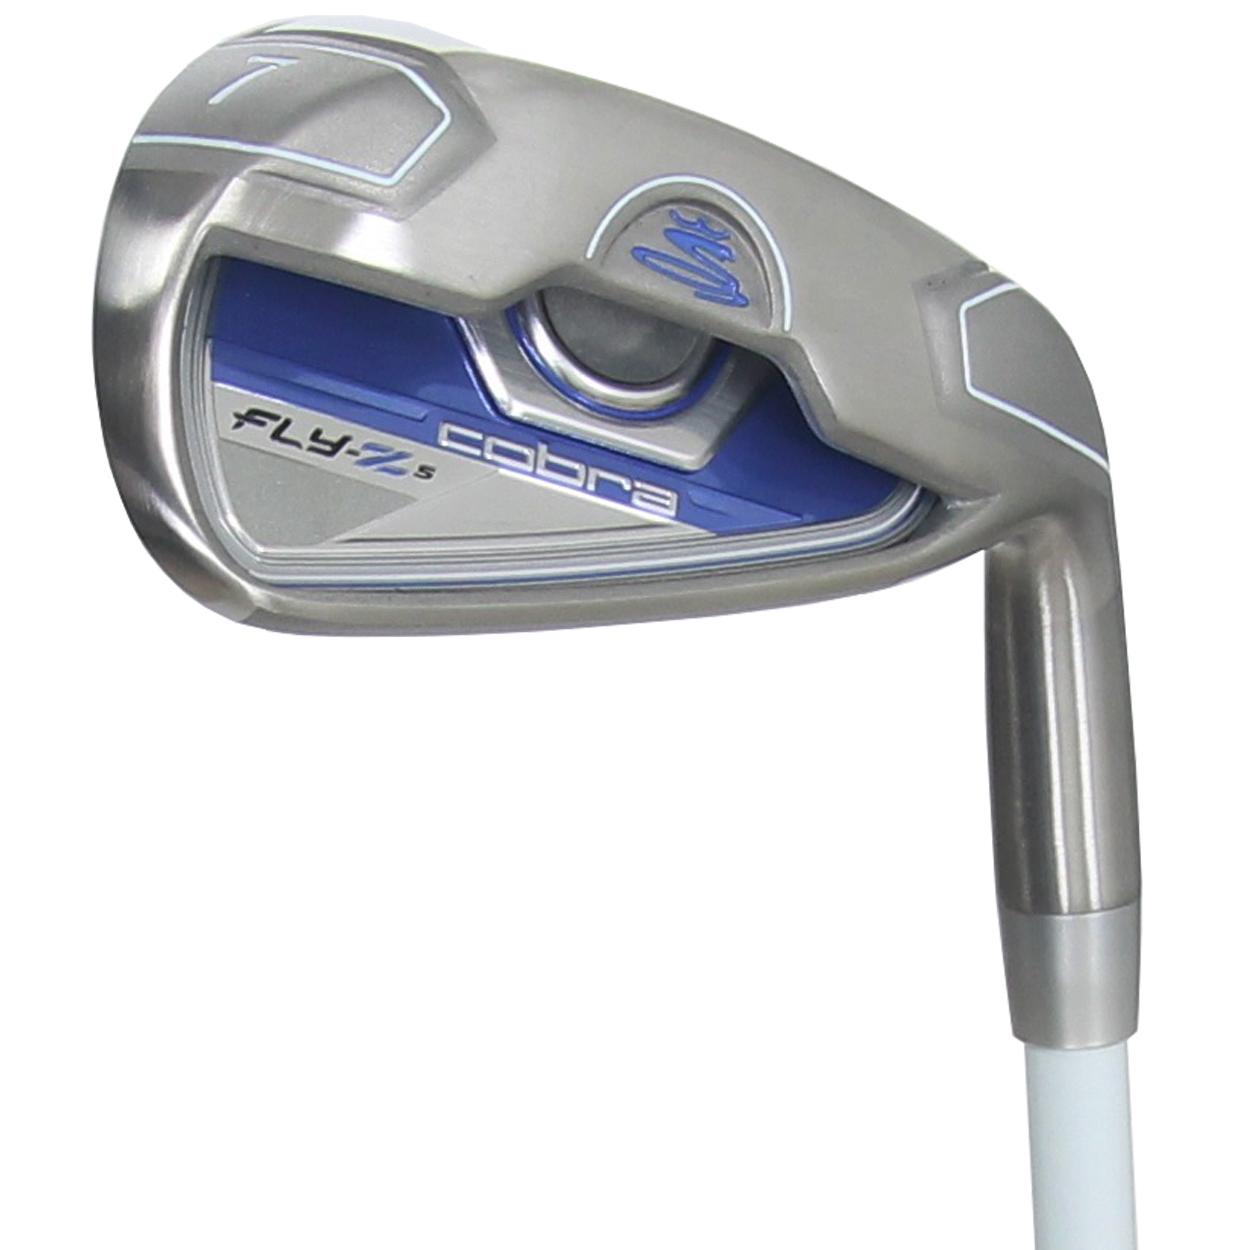 Cobra Golf Women S Blue Flyz S 7 Club 12 Piece Blue Golf